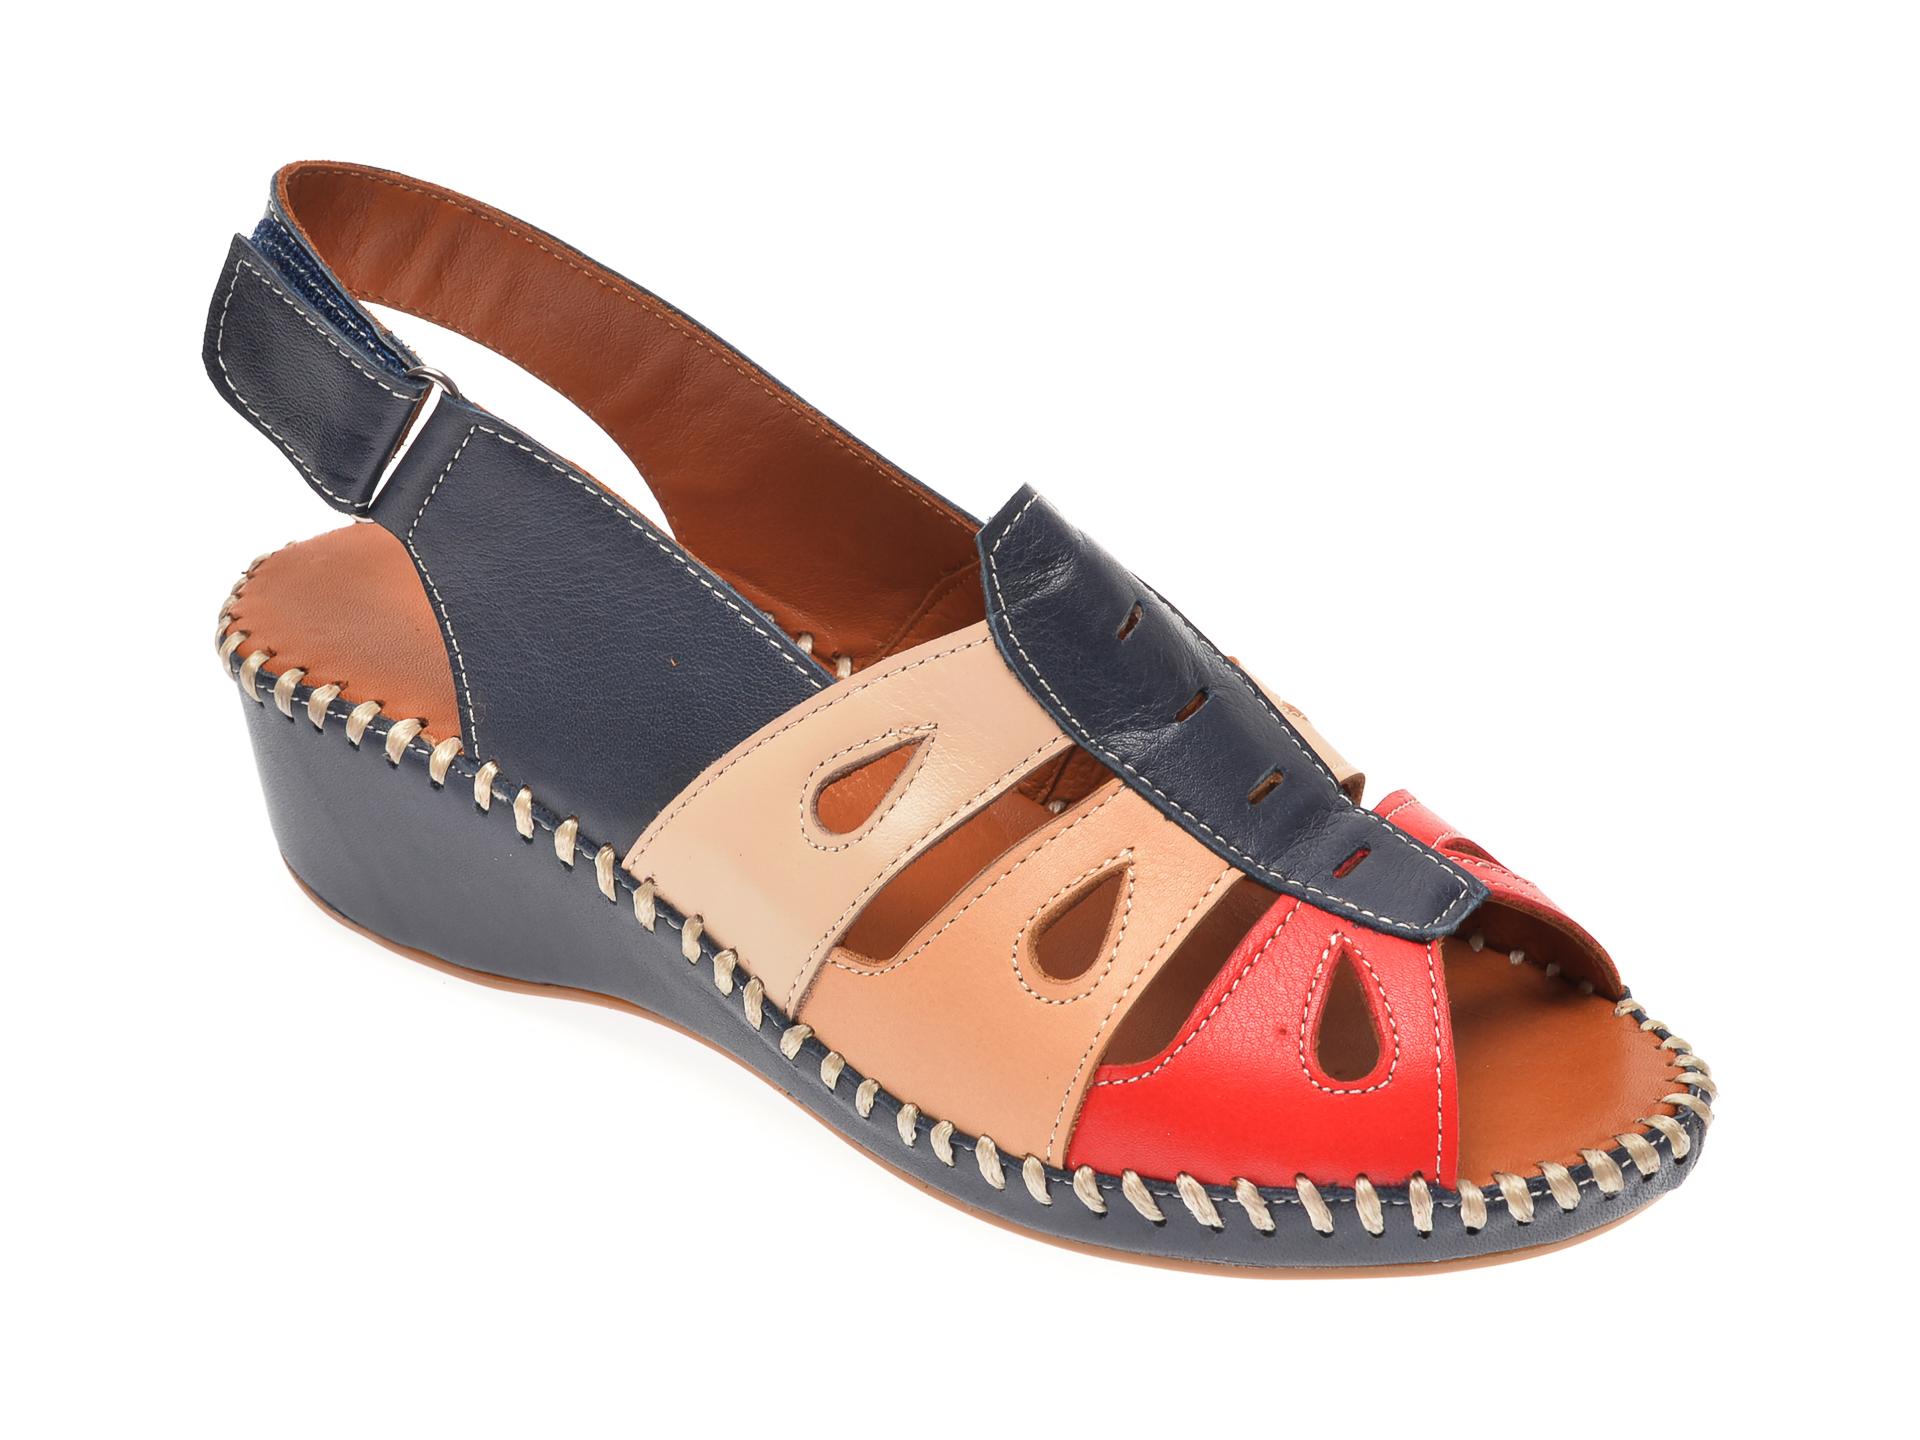 Sandale PASS COLLECTION bleumarin, 3166, din piele naturala